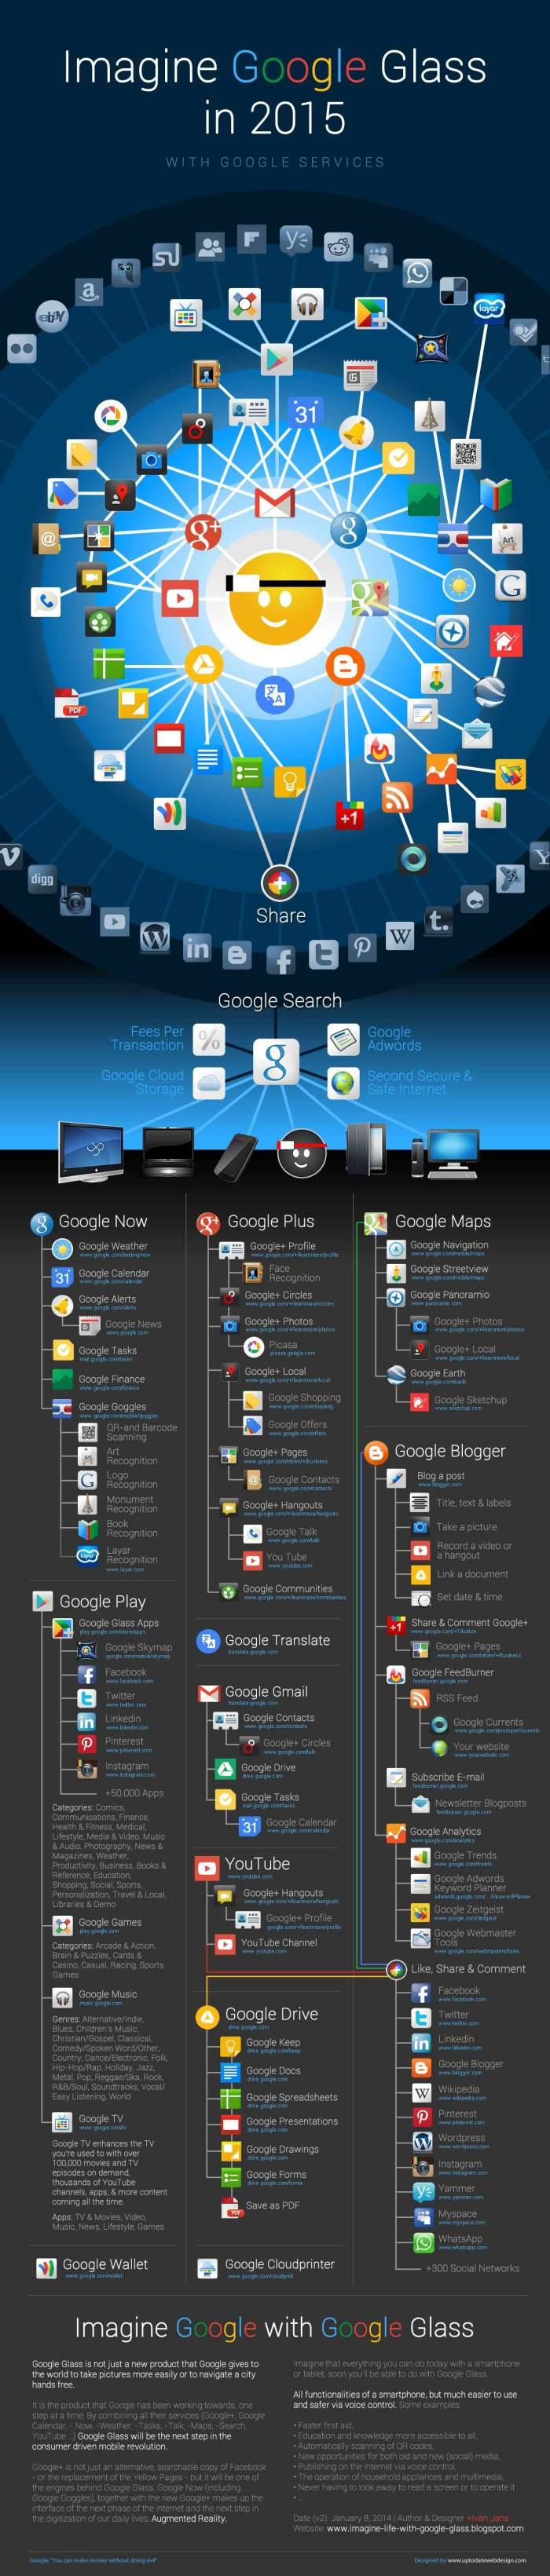 google-glass-2015